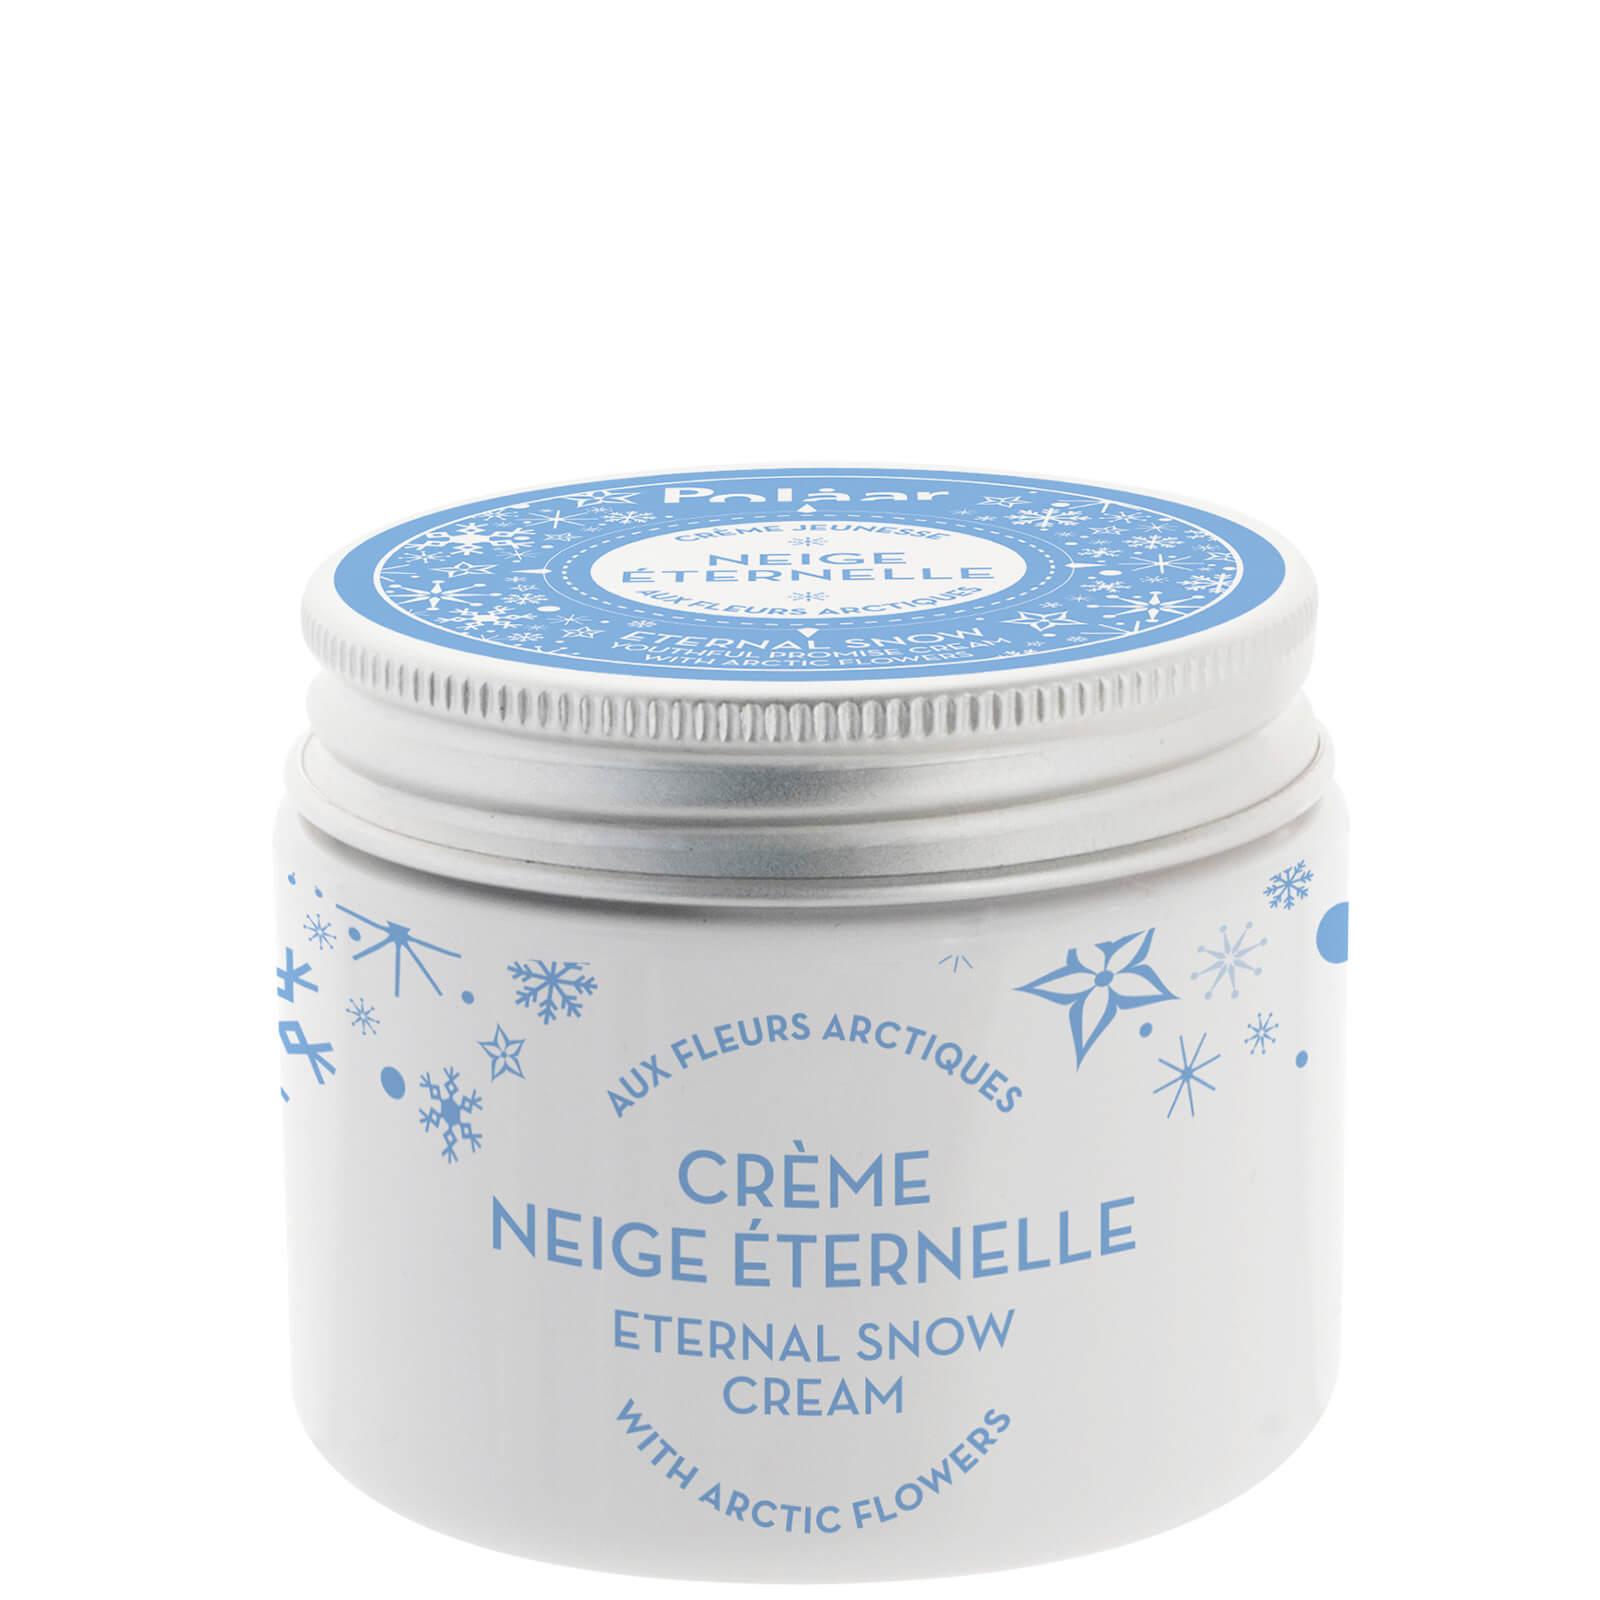 Купить Polaar Eternal Snow Cream 50ml